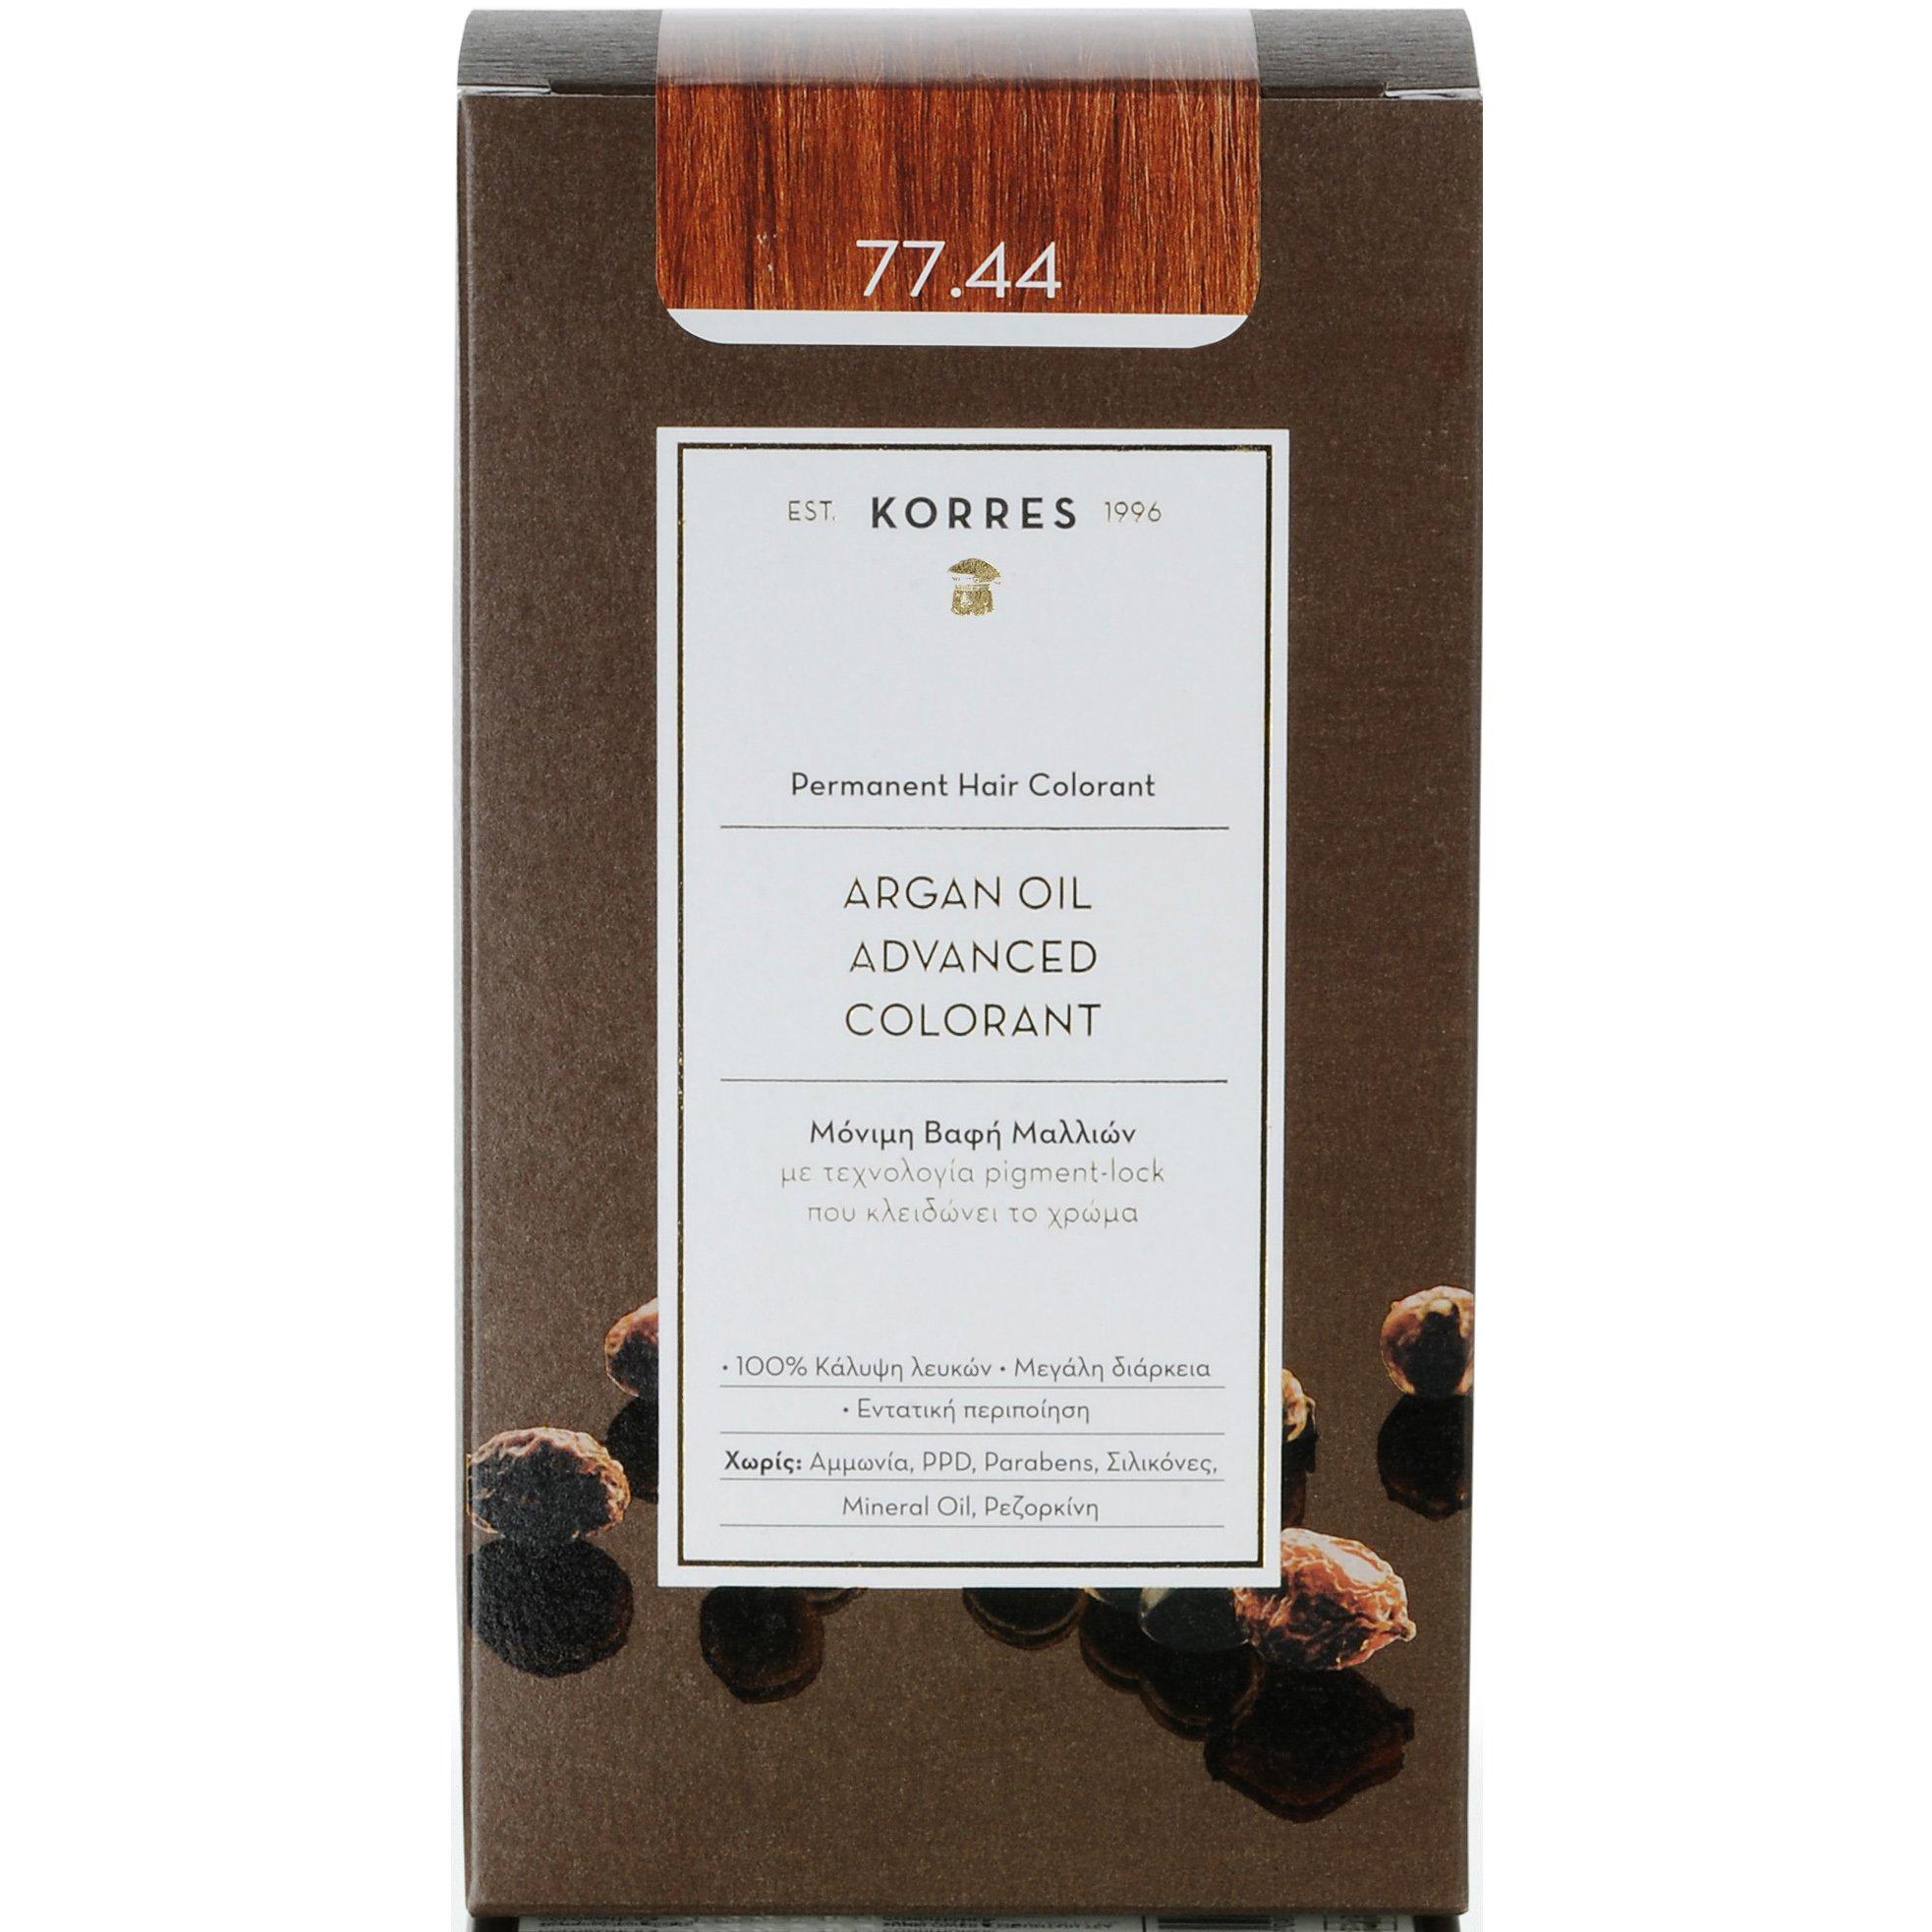 Korres Argan Oil Advanced Colorant Μόνιμη Βαφή Μαλλιών με Τεχνολογία Pigment-Lock που Κλειδώνει το Χρώμα 50ml – 77.44 ΞΑΝΘΟ ΕΝΤΟΝΟ ΧΑΛΚΙΝΟ